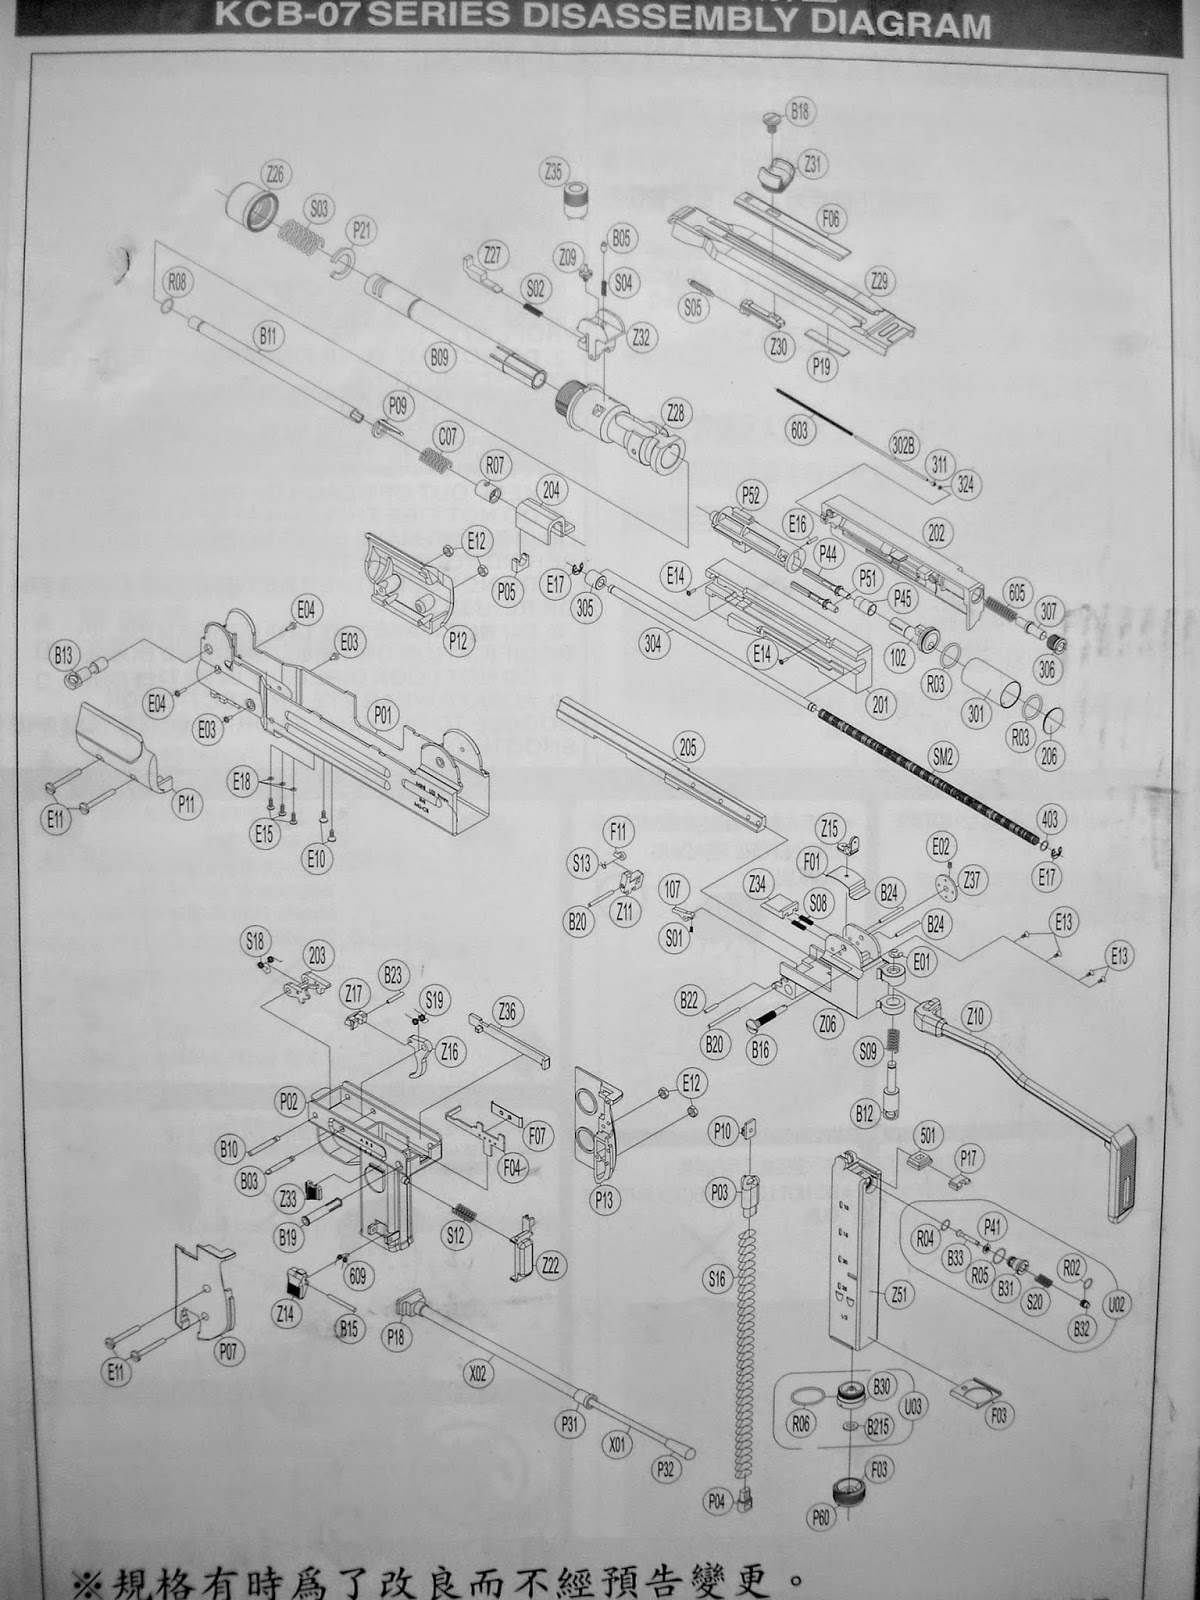 Glock 23 Disassembly Diagram Honda Vtx 1300 Wiring Disassembly, Diy, My Airsoft Gun, And Other Things: Kwc Mini Uzi (explode ...